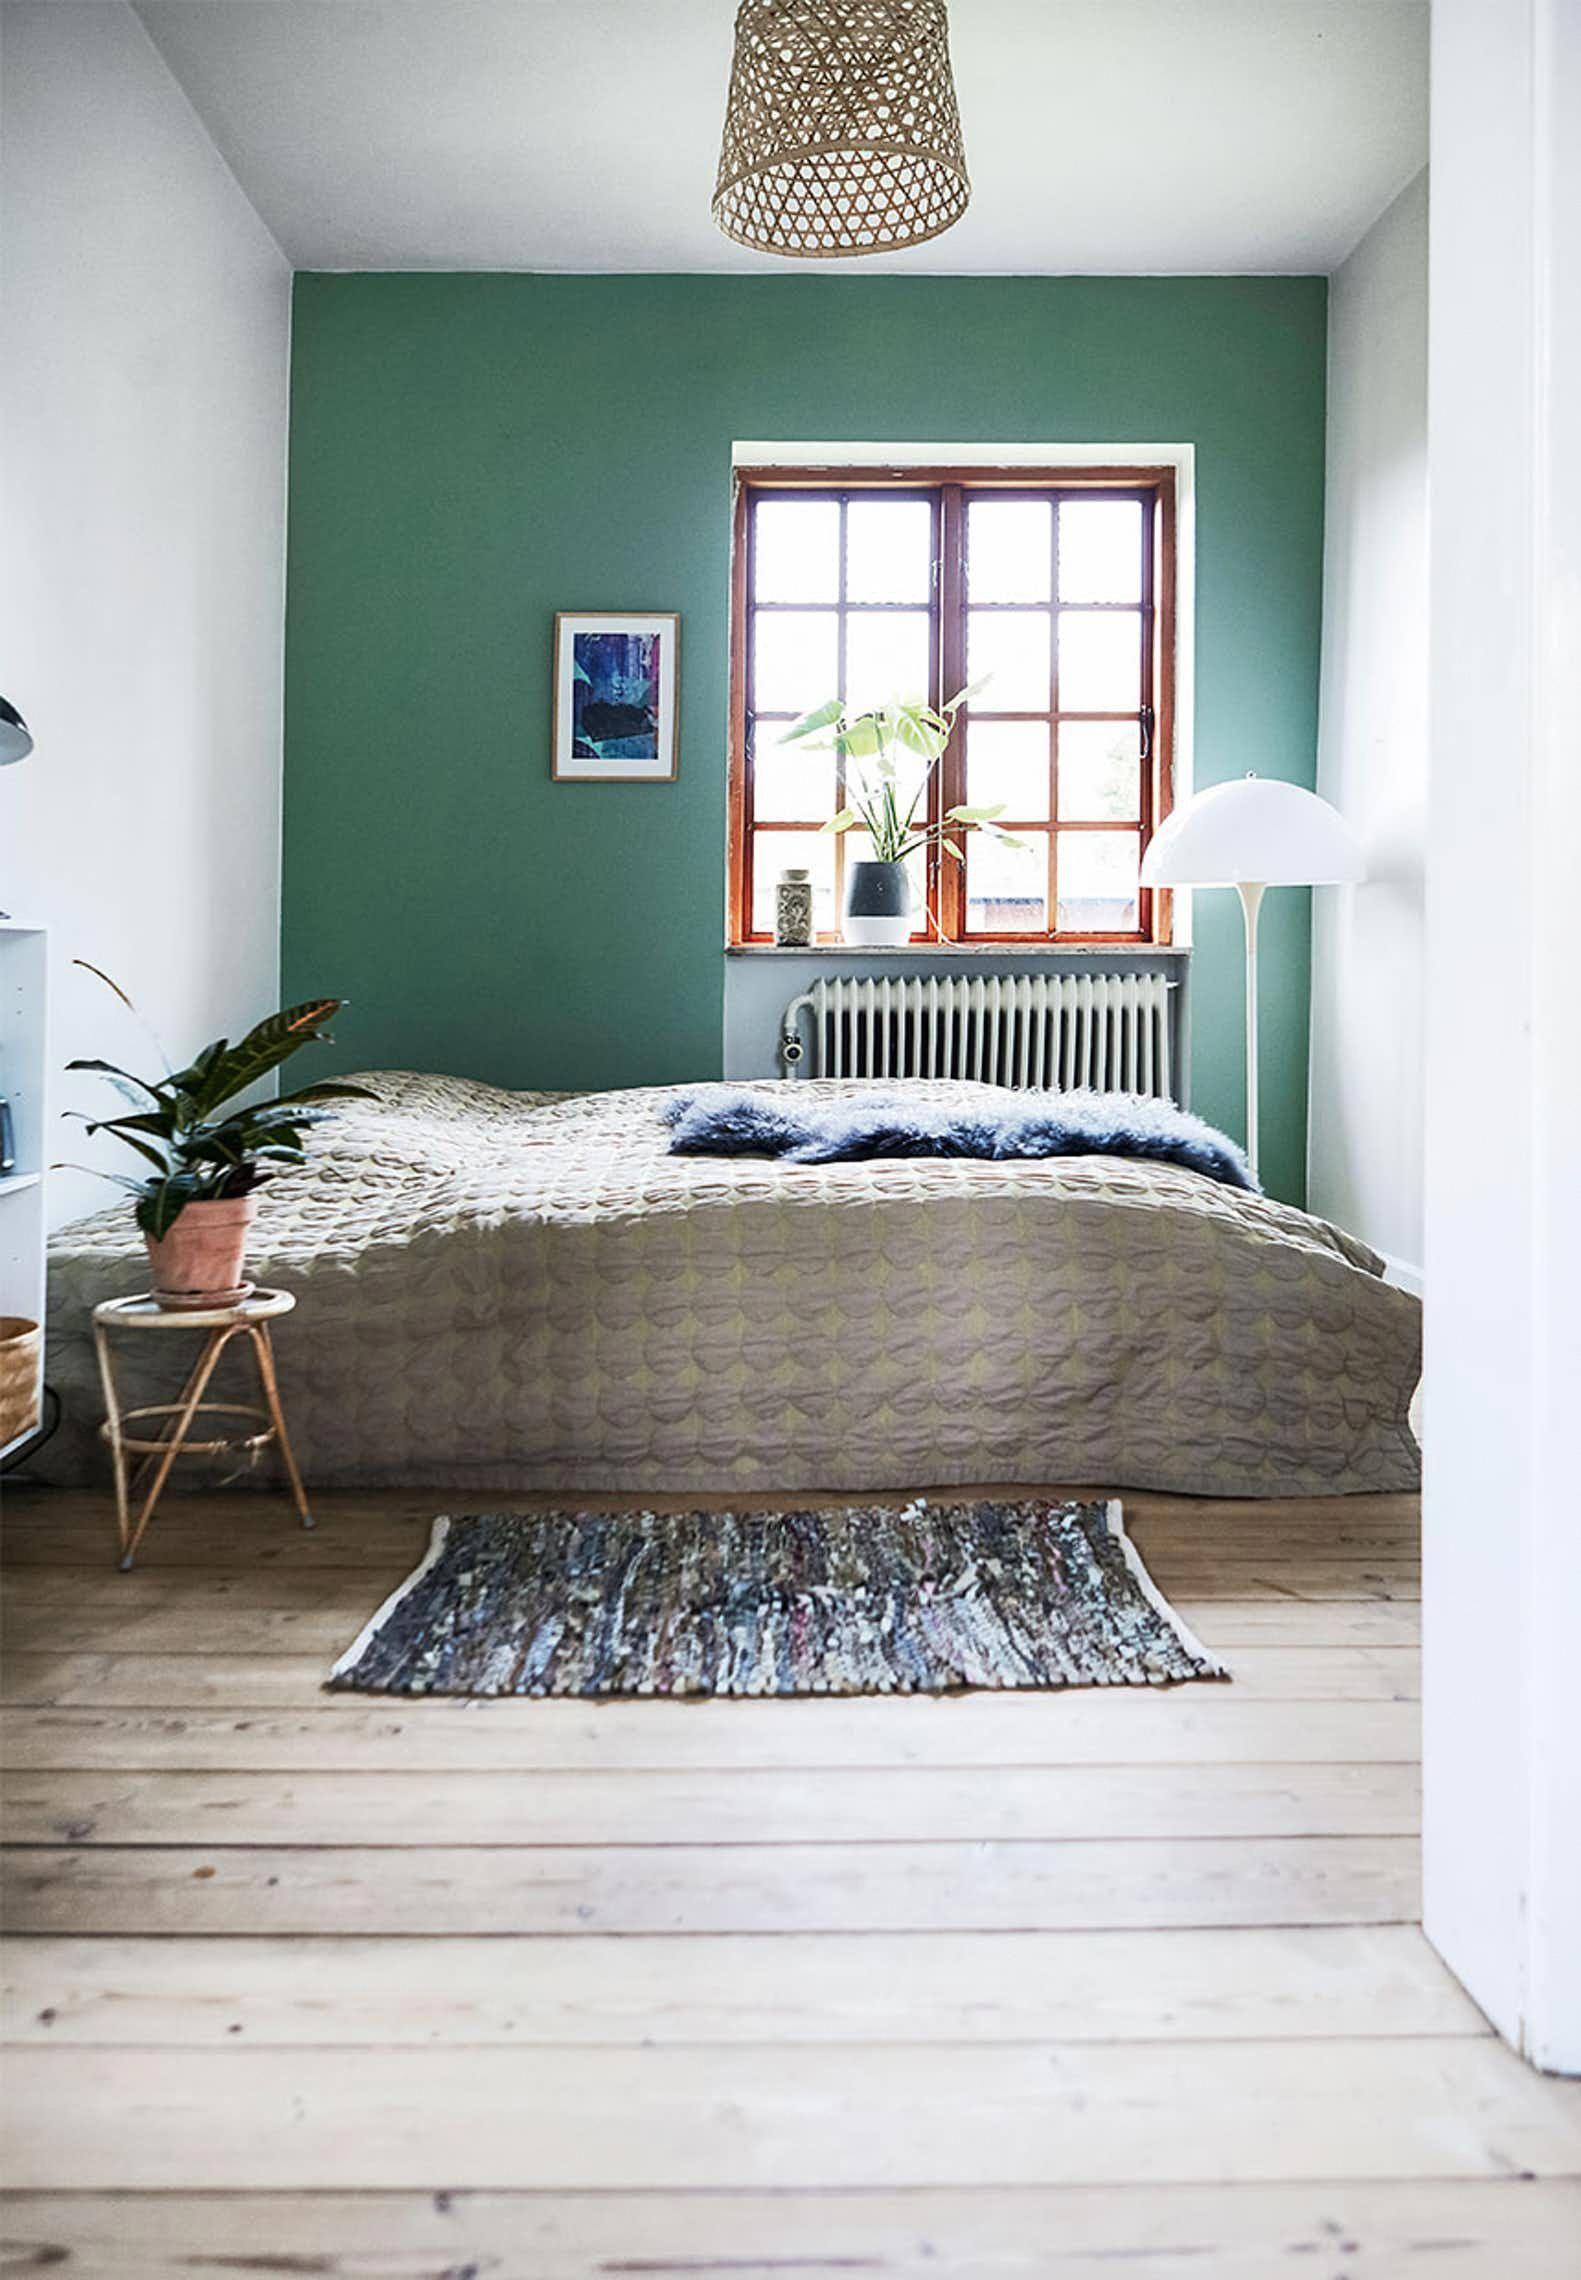 Soveværelsezonen homedecoraccessories Green bedroom